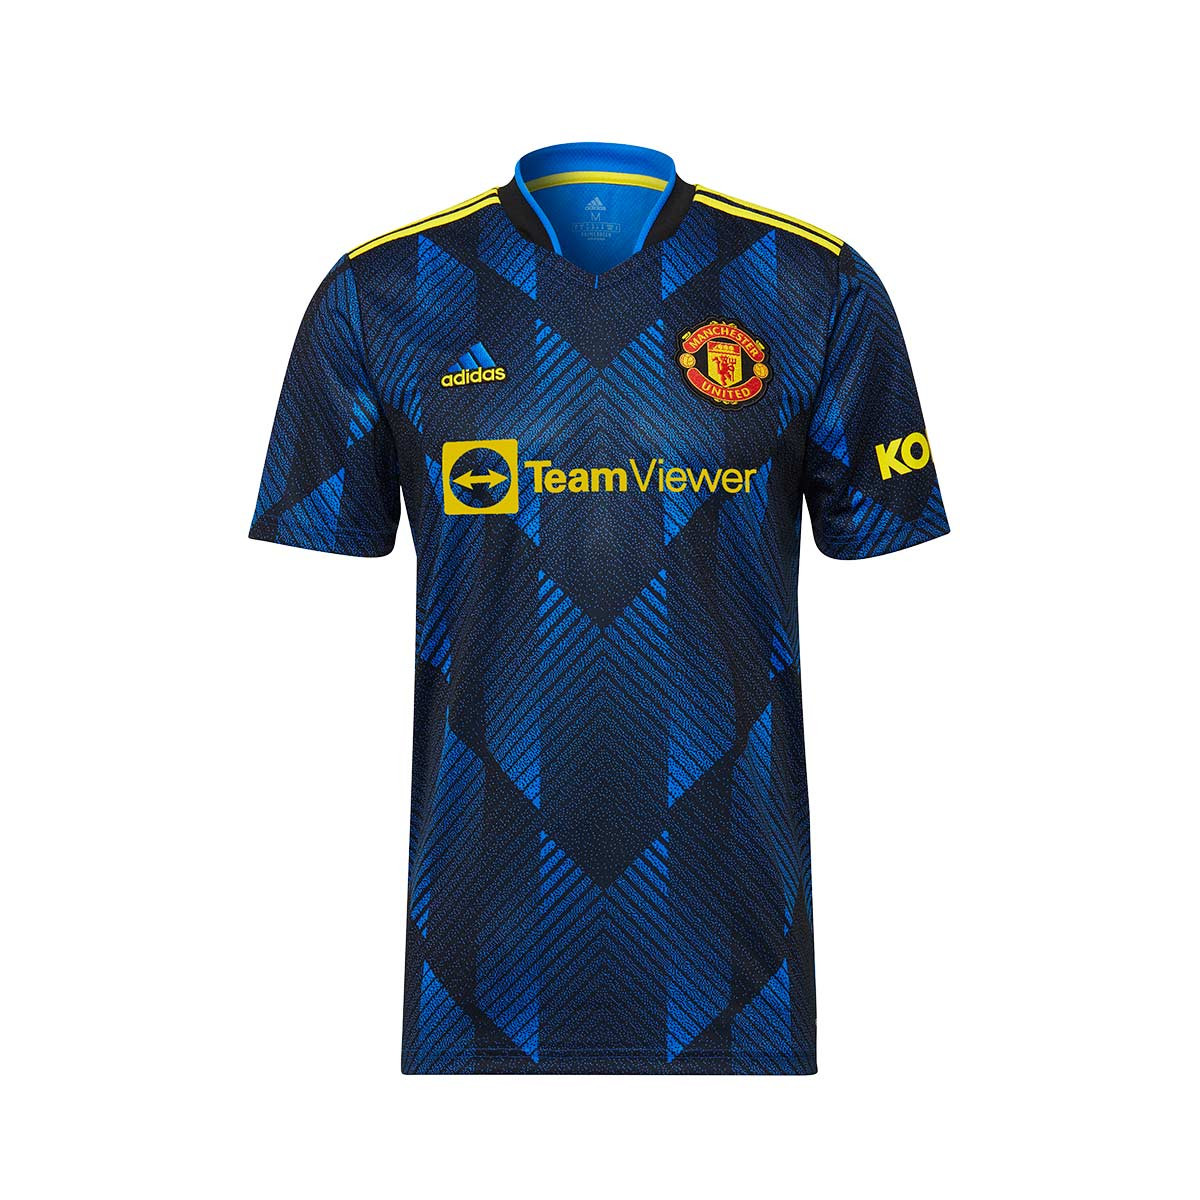 adidas Manchester United Third Jersey 2021-2022 Jersey